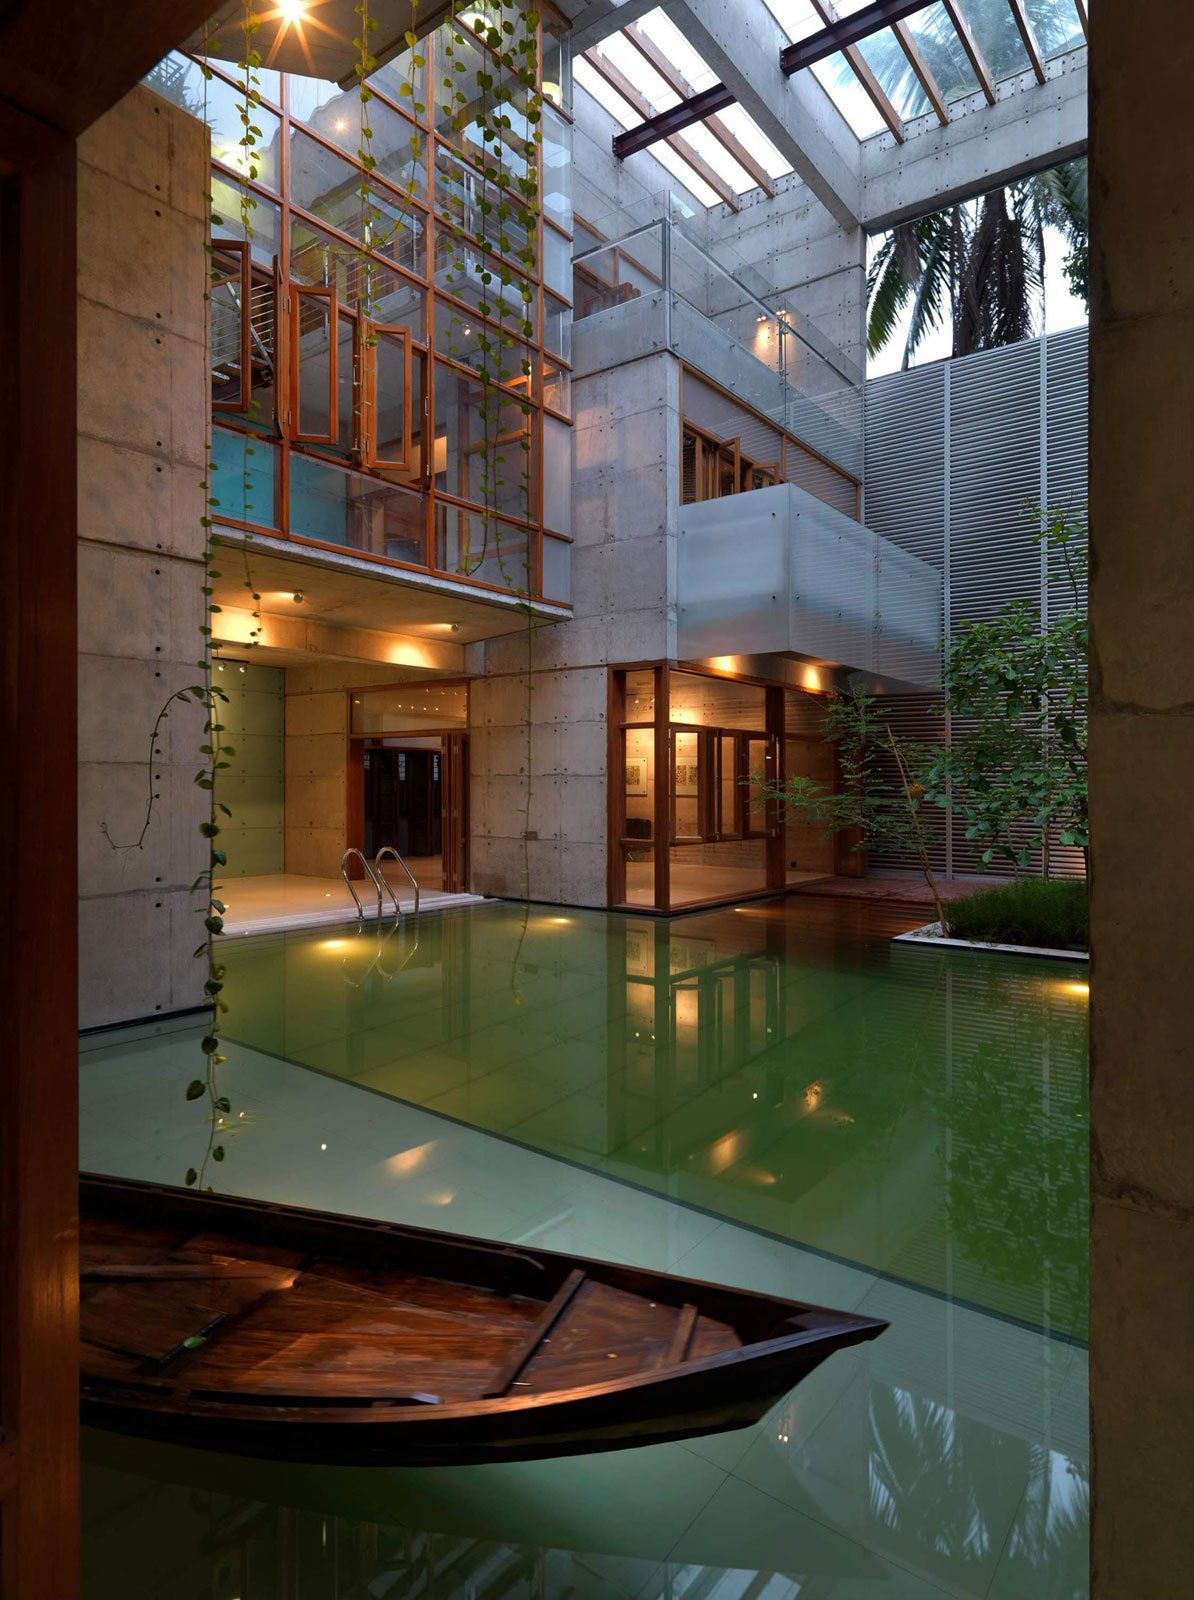 Home-office-innenarchitektur ideen  interior design ideas of the month  january   terrazas y